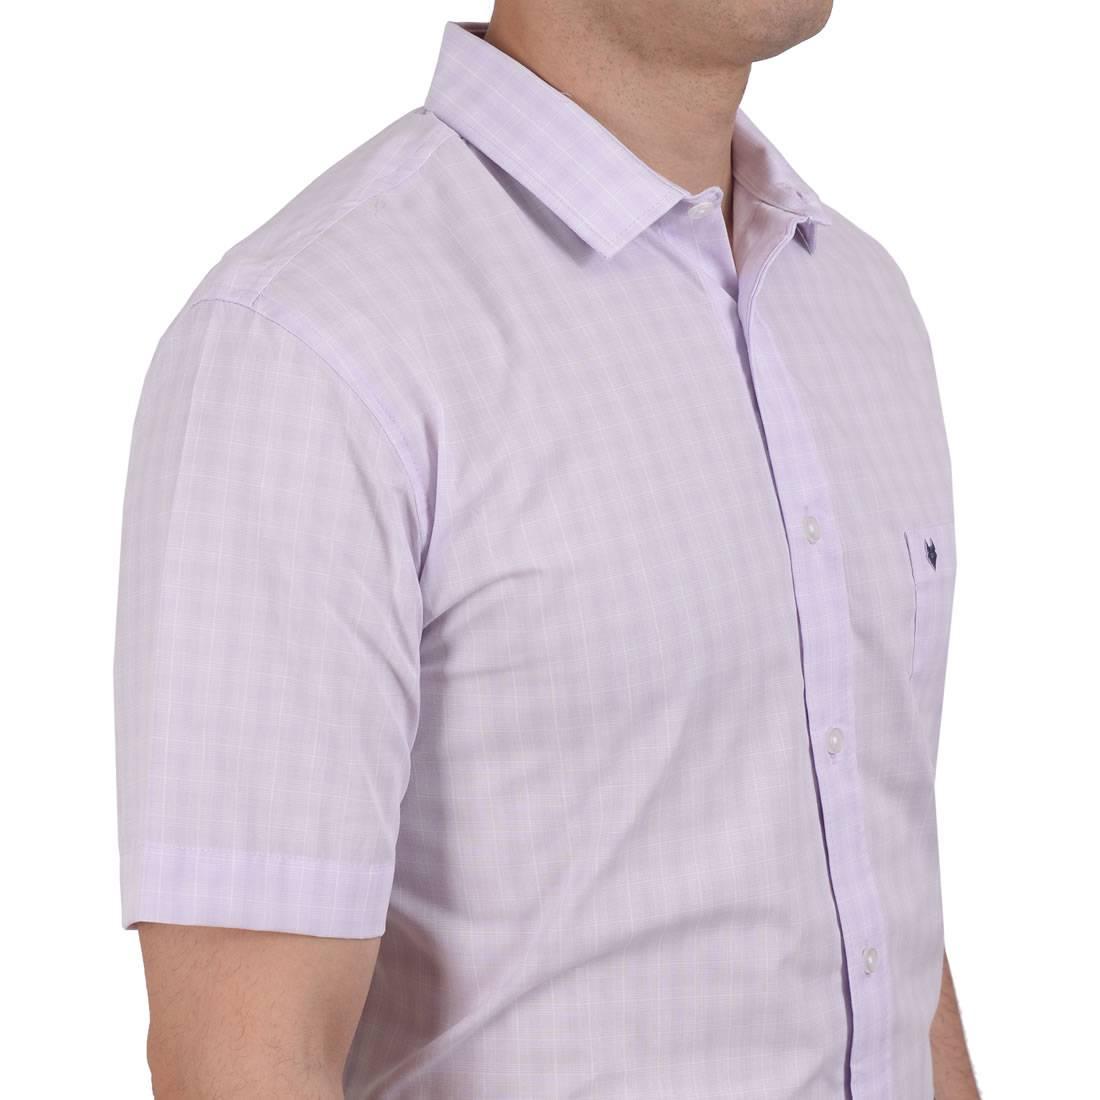 04C217432941-04-Camisa-Casual-Manga-Corta-Classic-Fit-Lila-yale